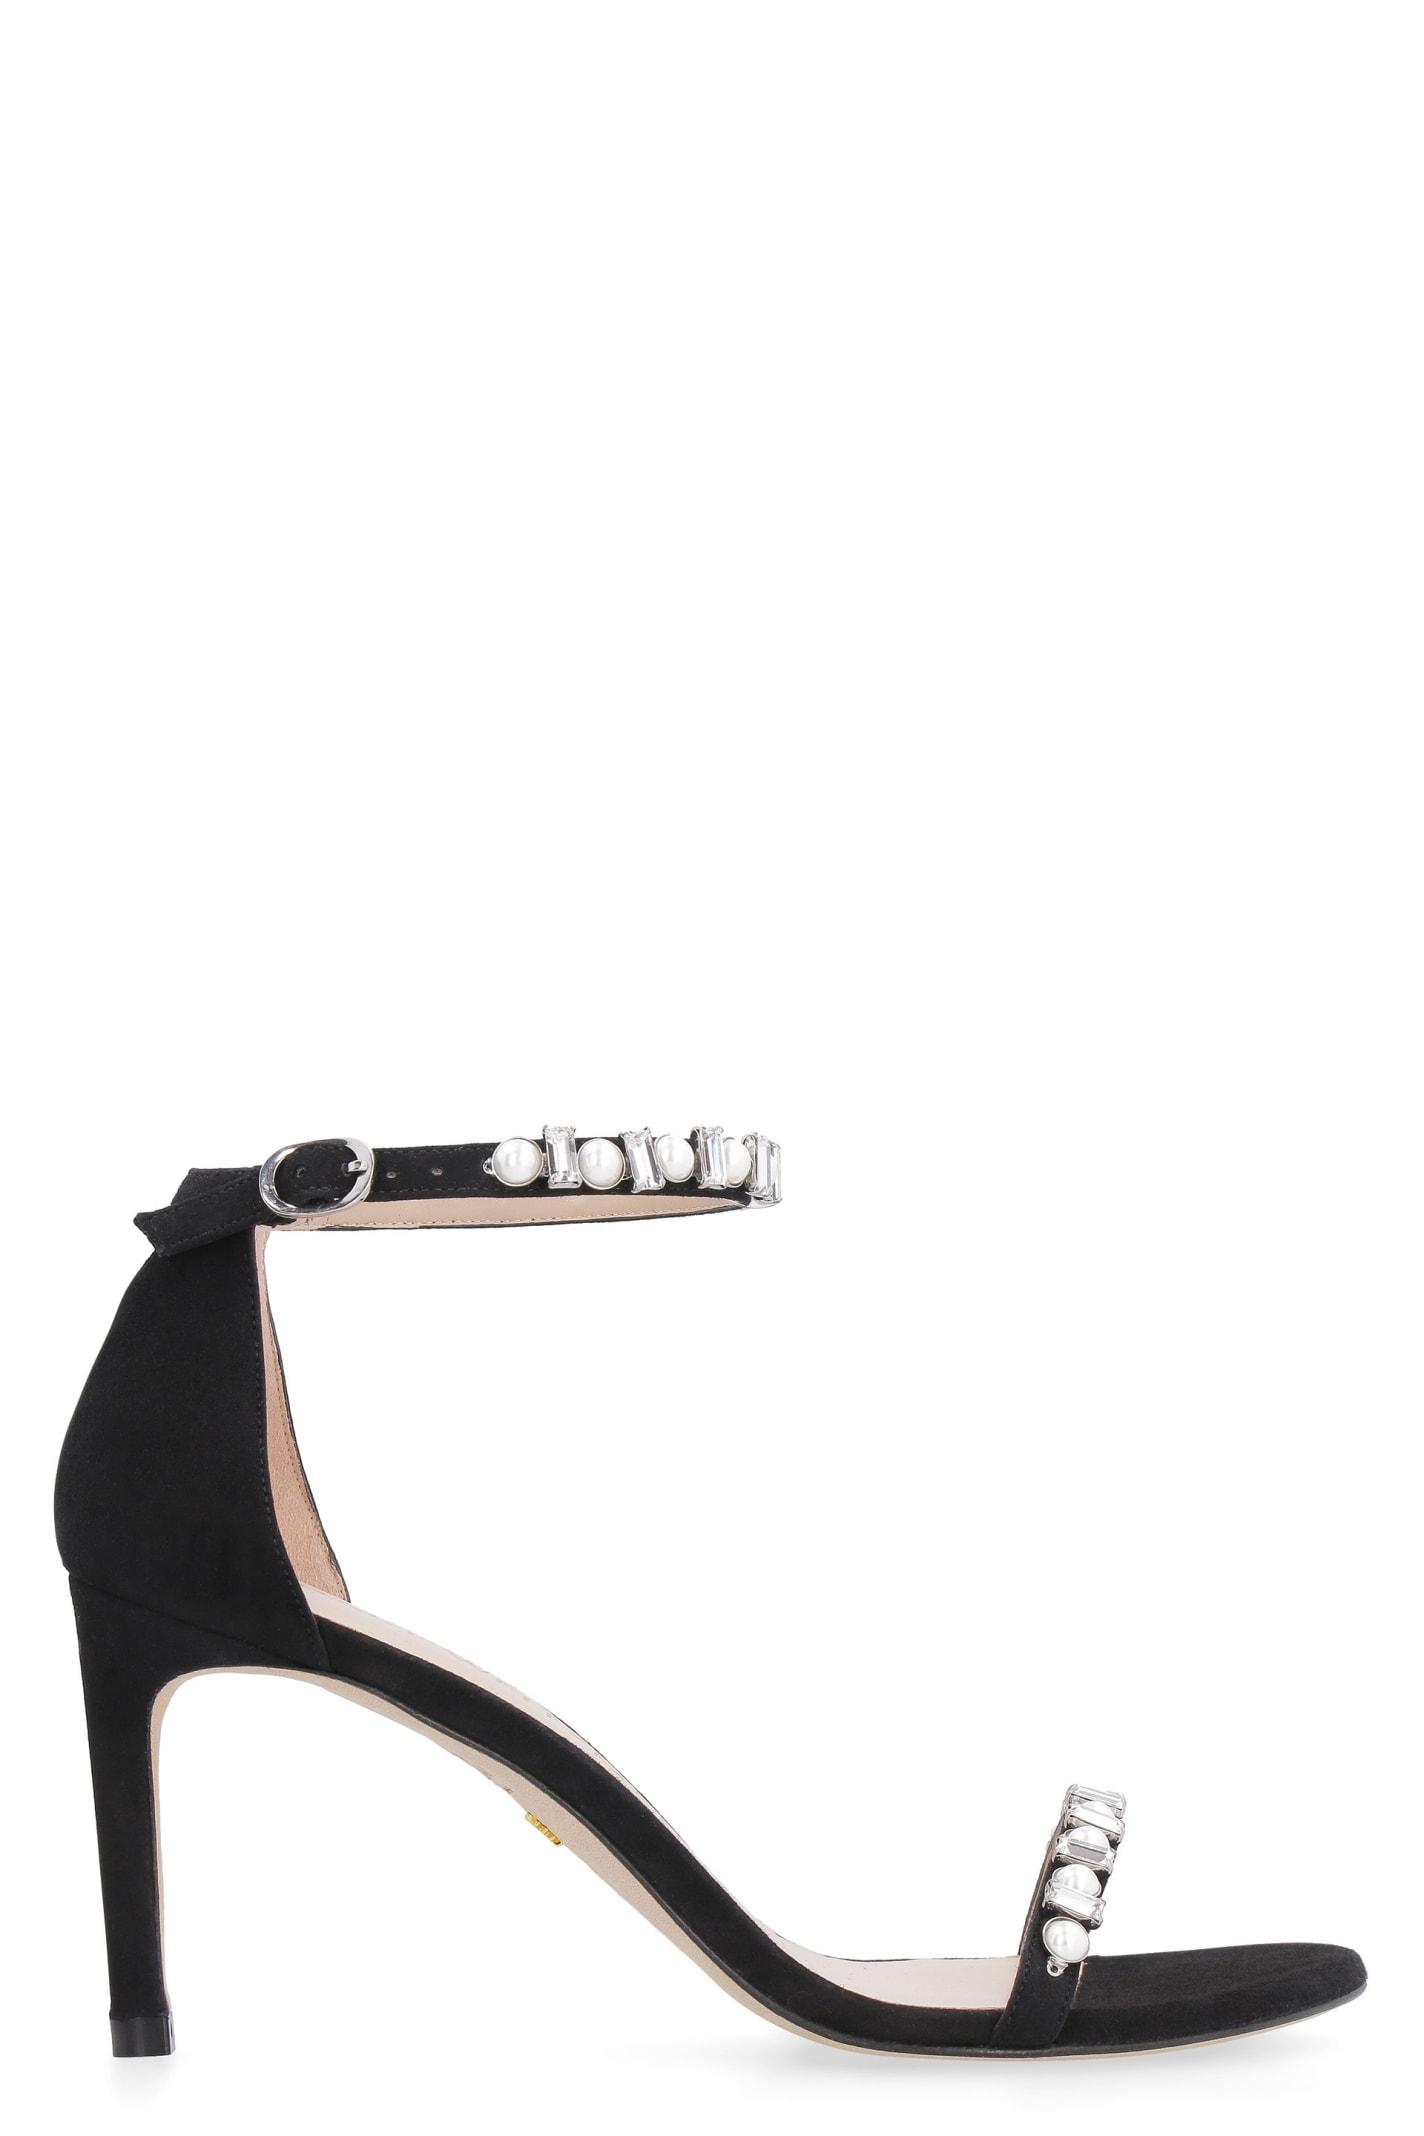 Buy Stuart Weitzman Sue Suede Sandals online, shop Stuart Weitzman shoes with free shipping